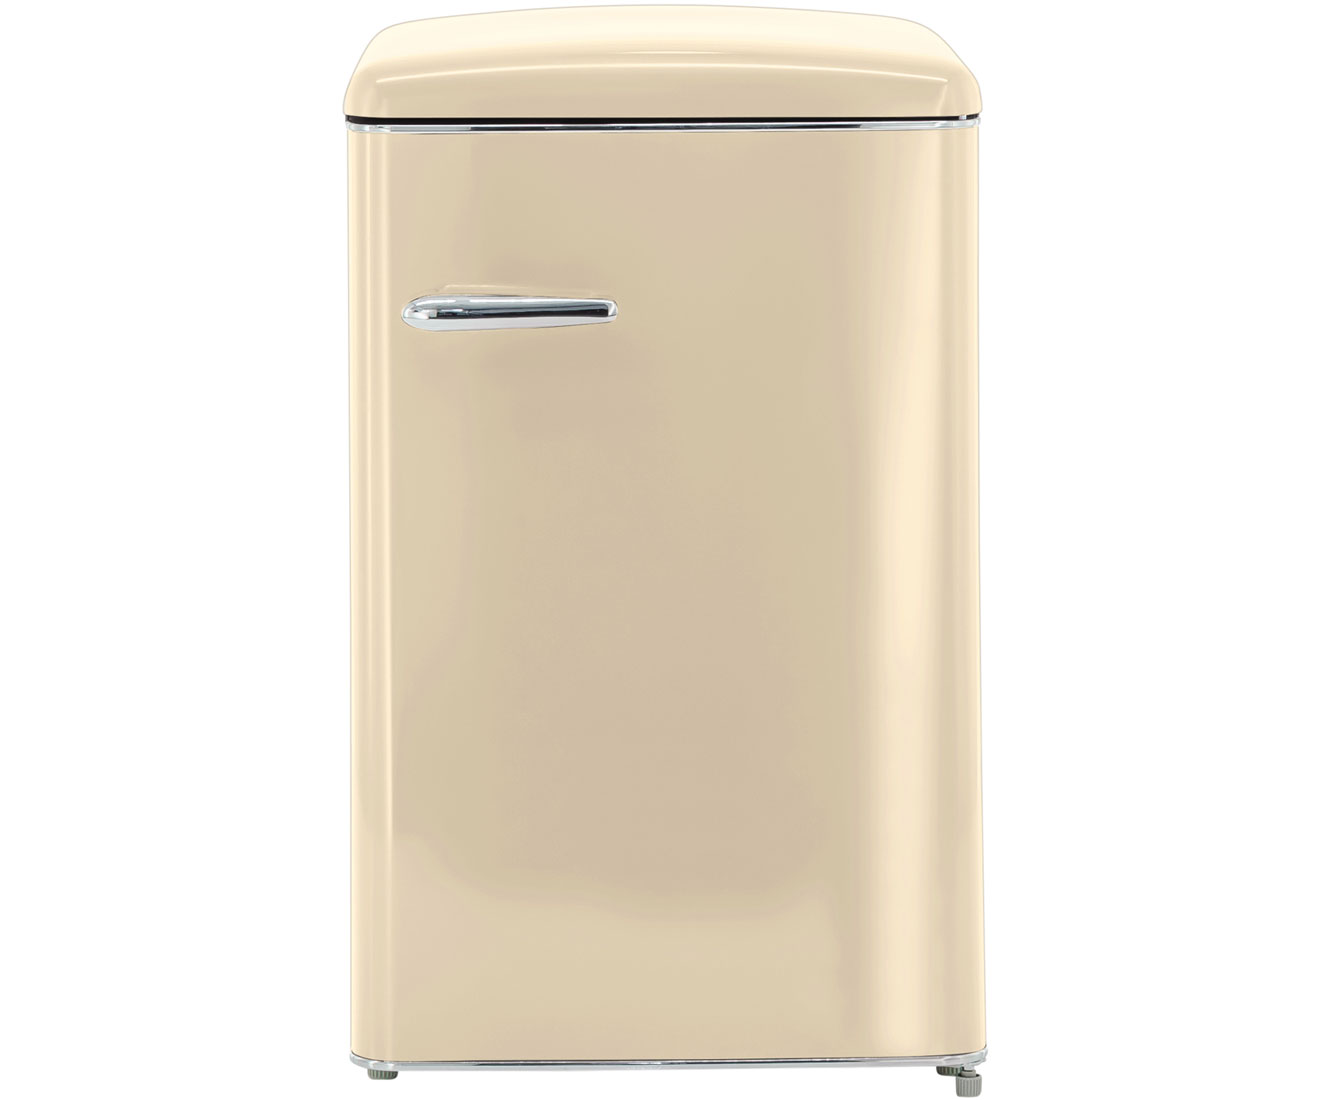 Retro Kühlschrank Gelb : Amica kühlschrank gelb retro kühlschränke amica gelbe